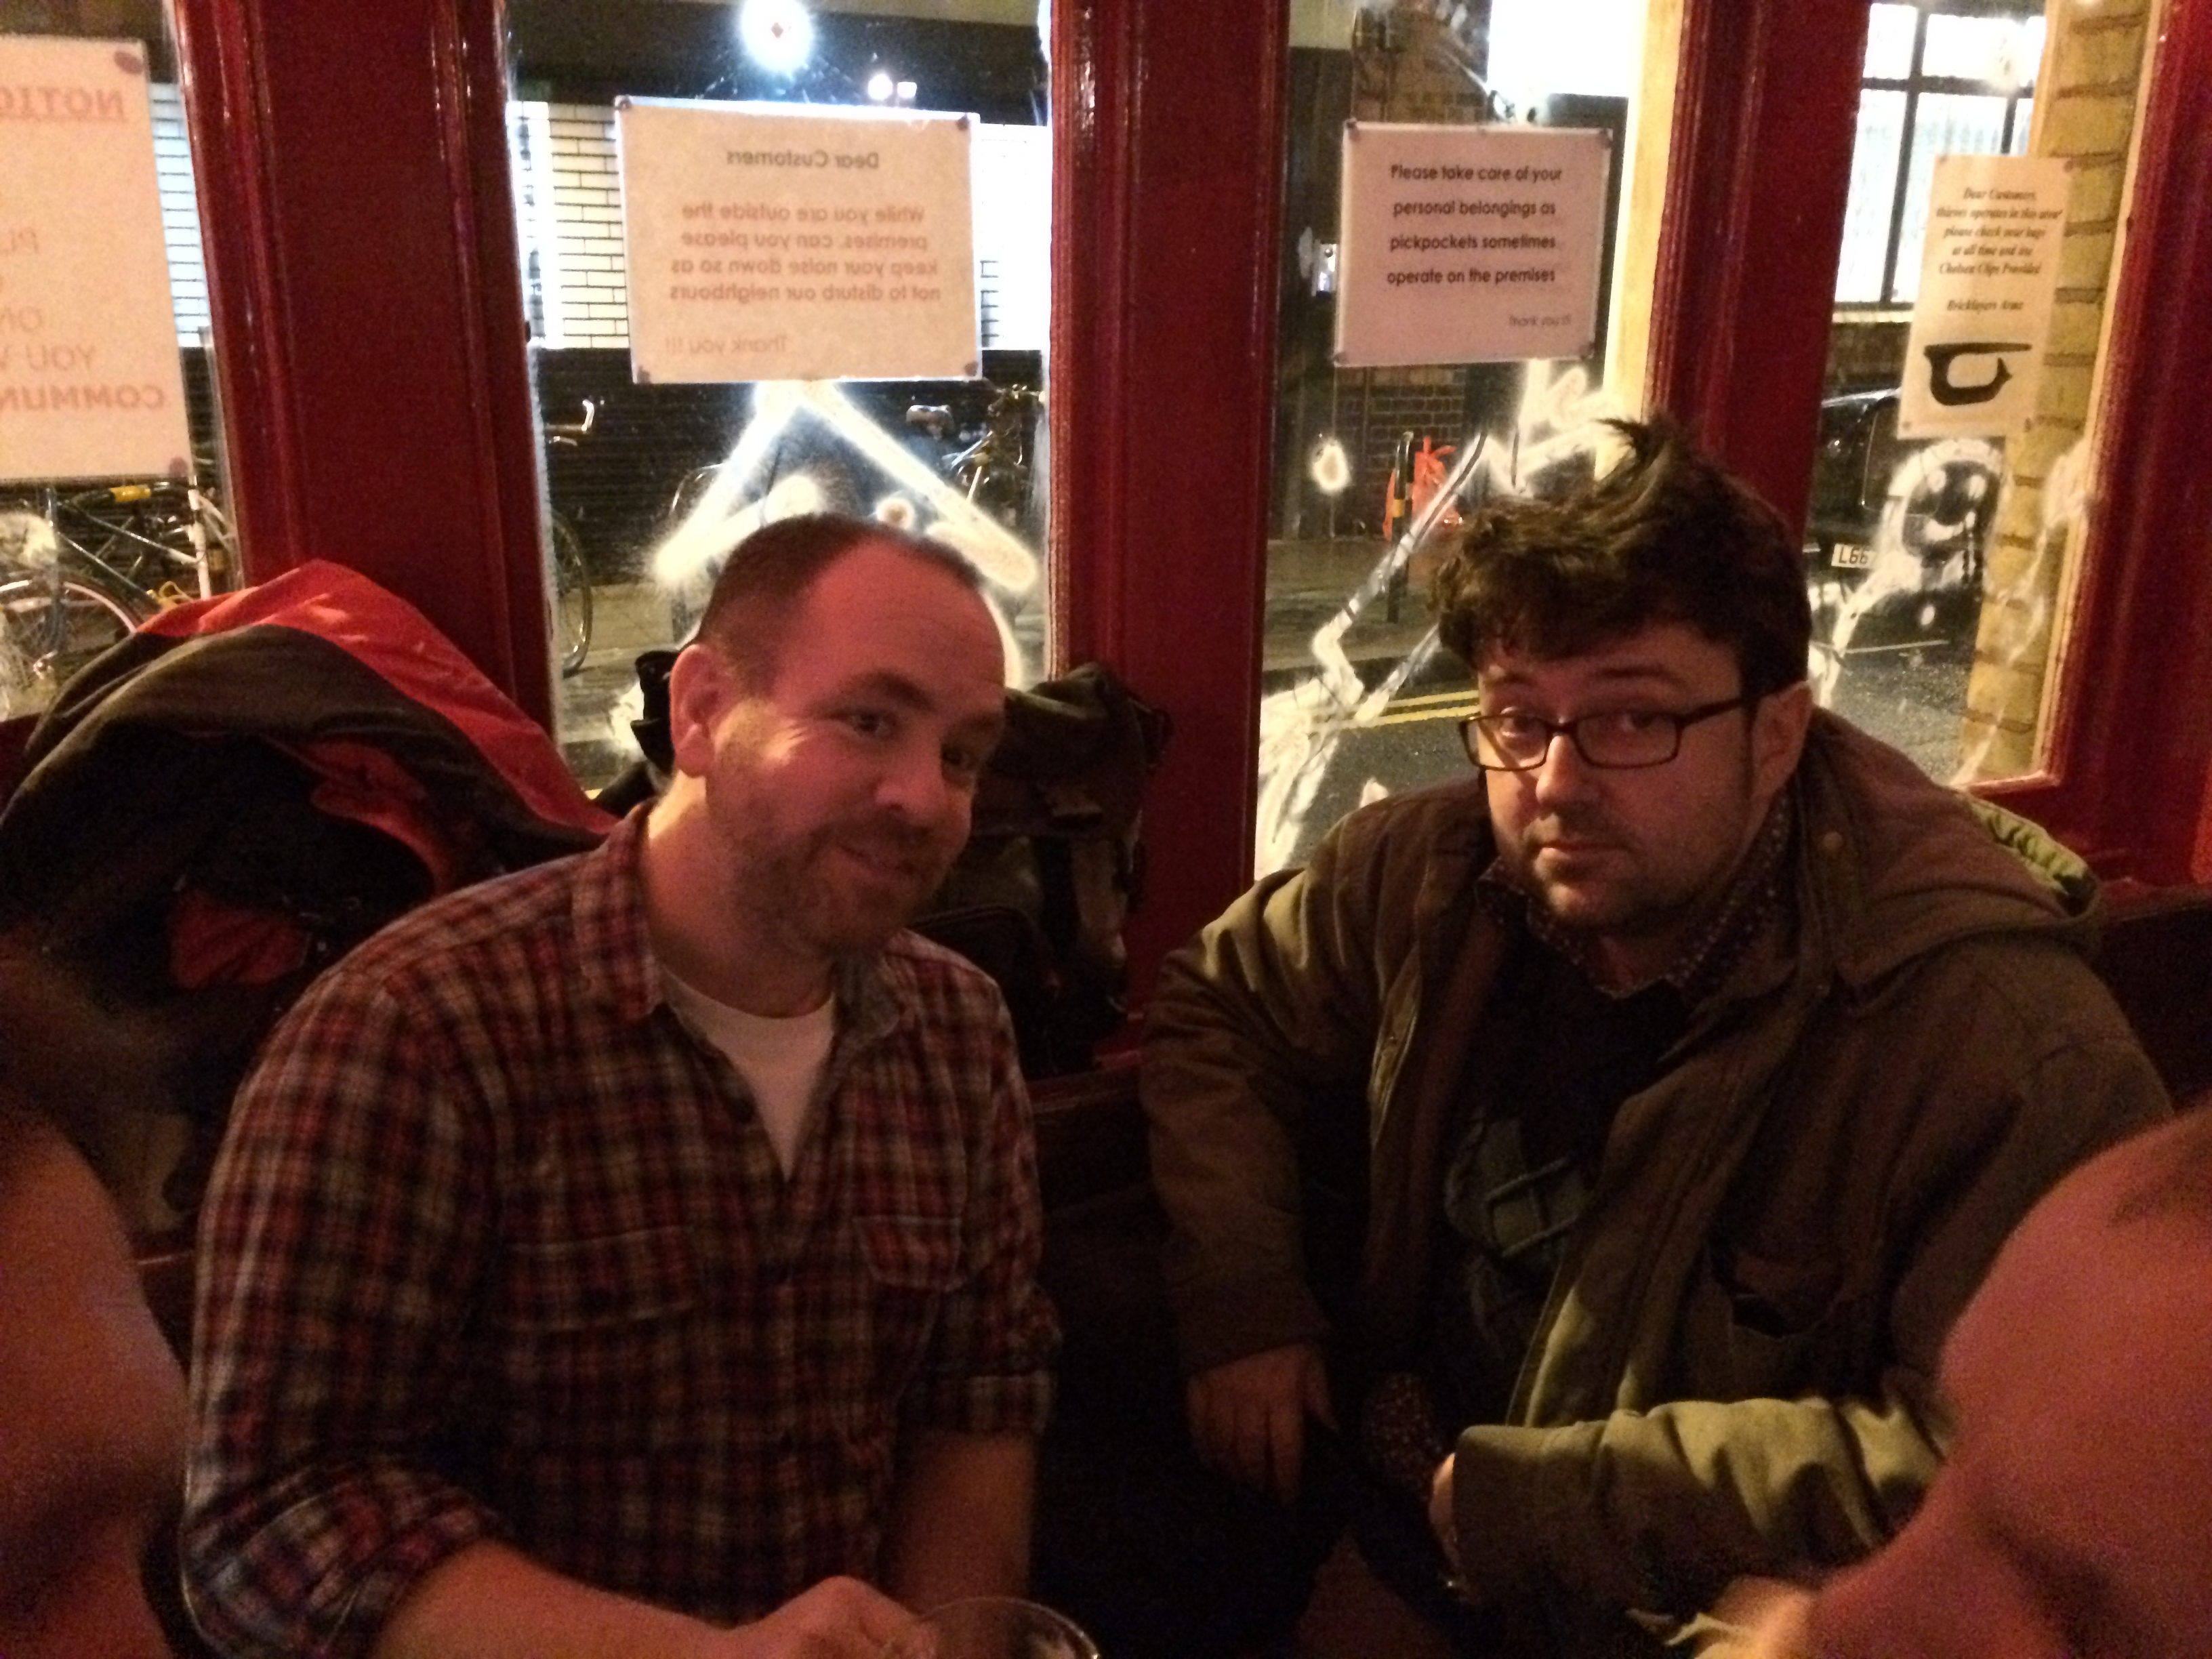 @lyntor and @jeremytarling